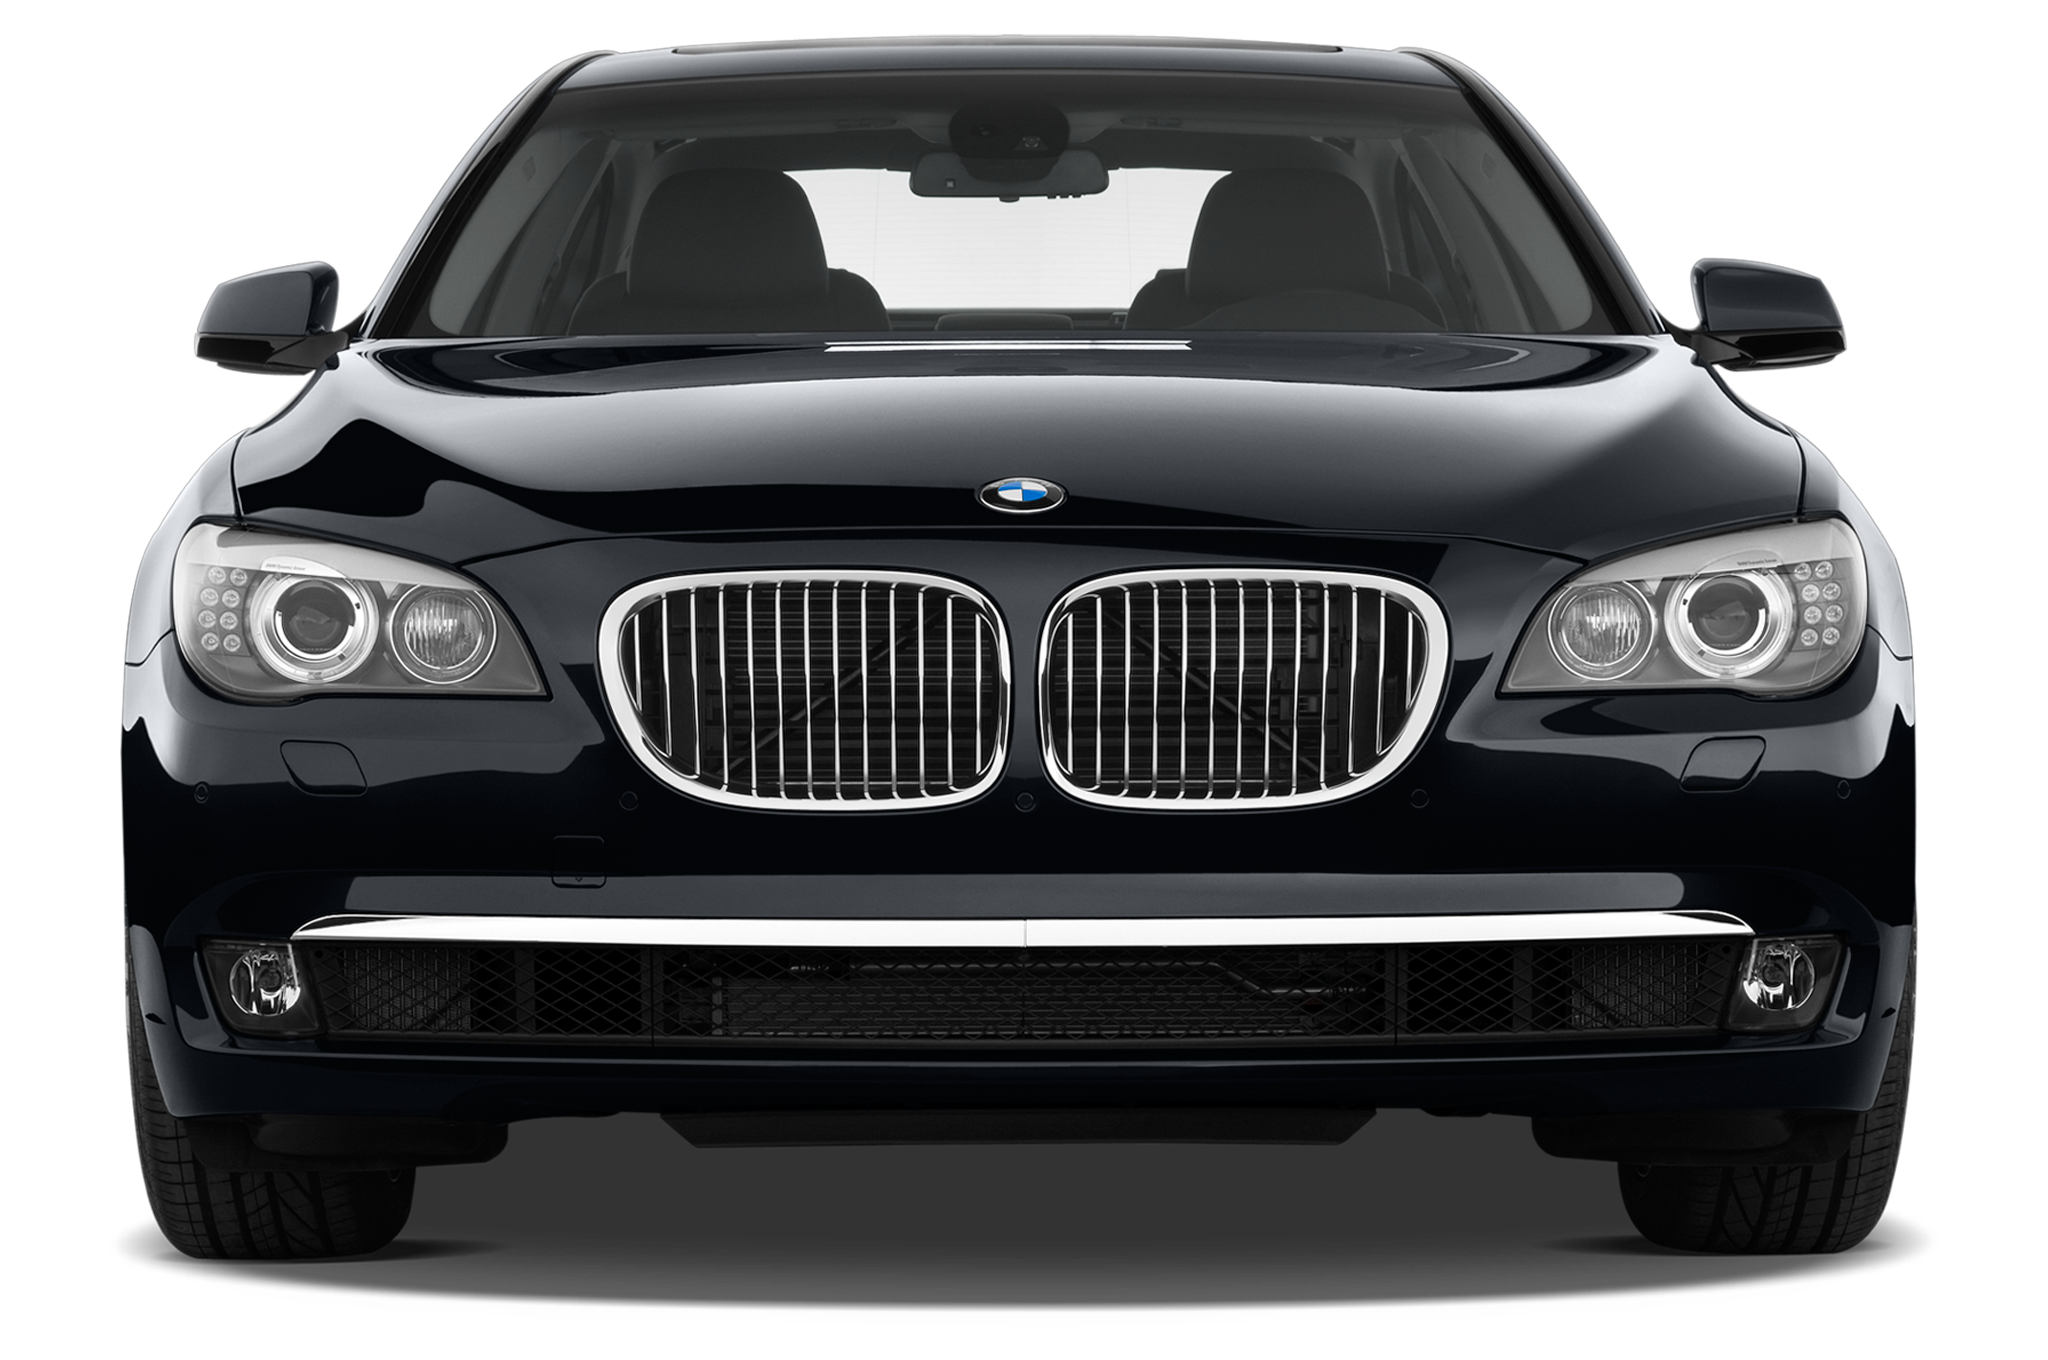 2010 bmw 760li bmw luxury sedan review automobile magazine. Black Bedroom Furniture Sets. Home Design Ideas